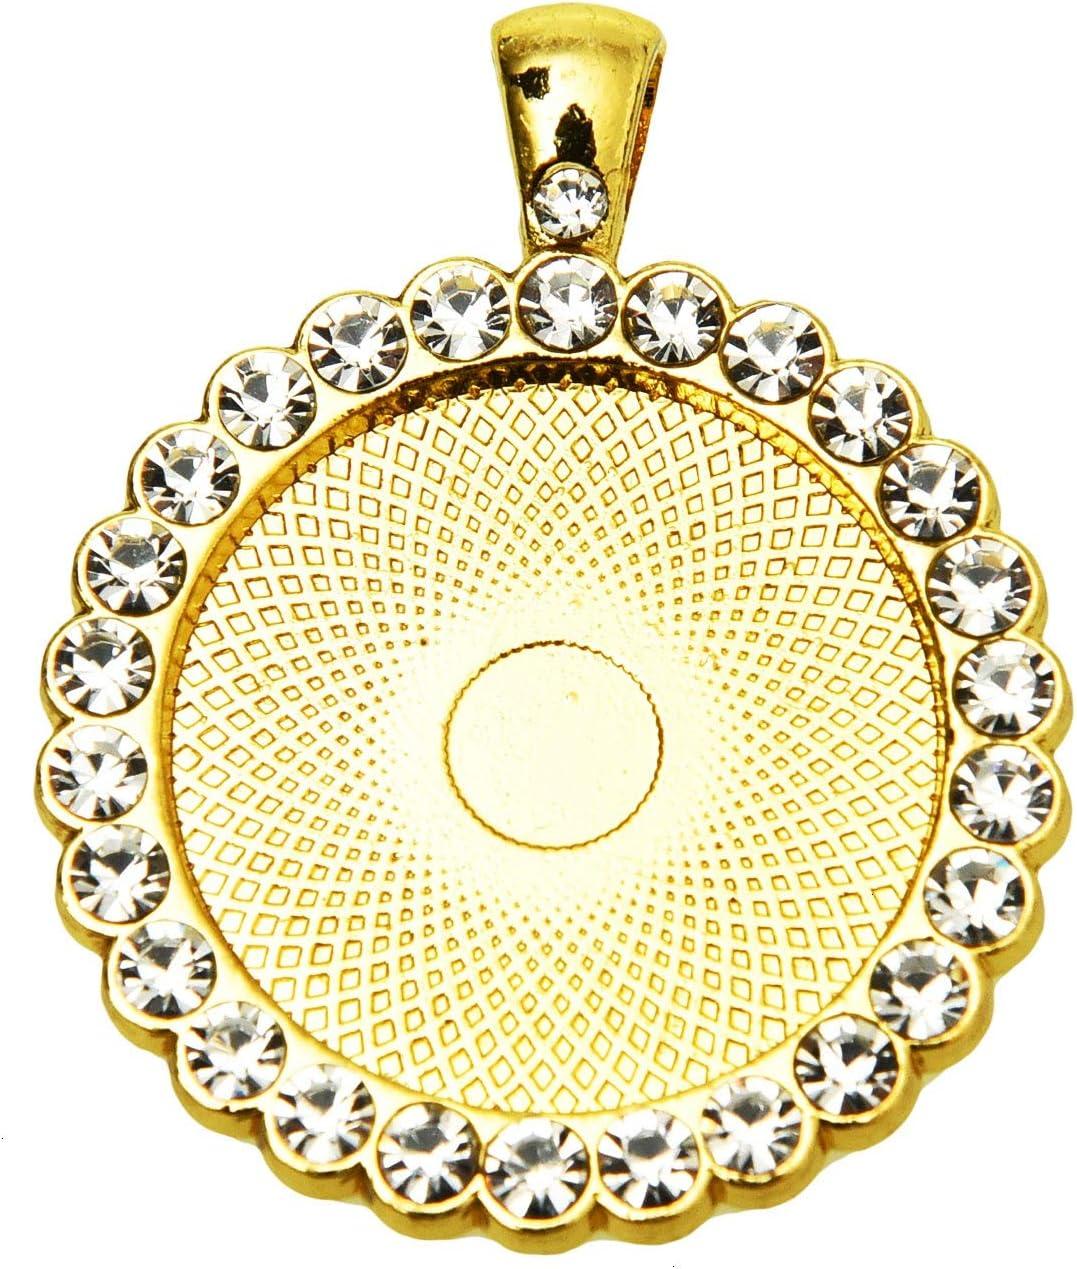 10Pcs 25mm Base Blank Bezel Cabochon Setting Jewelry Round Pendant Trays UK